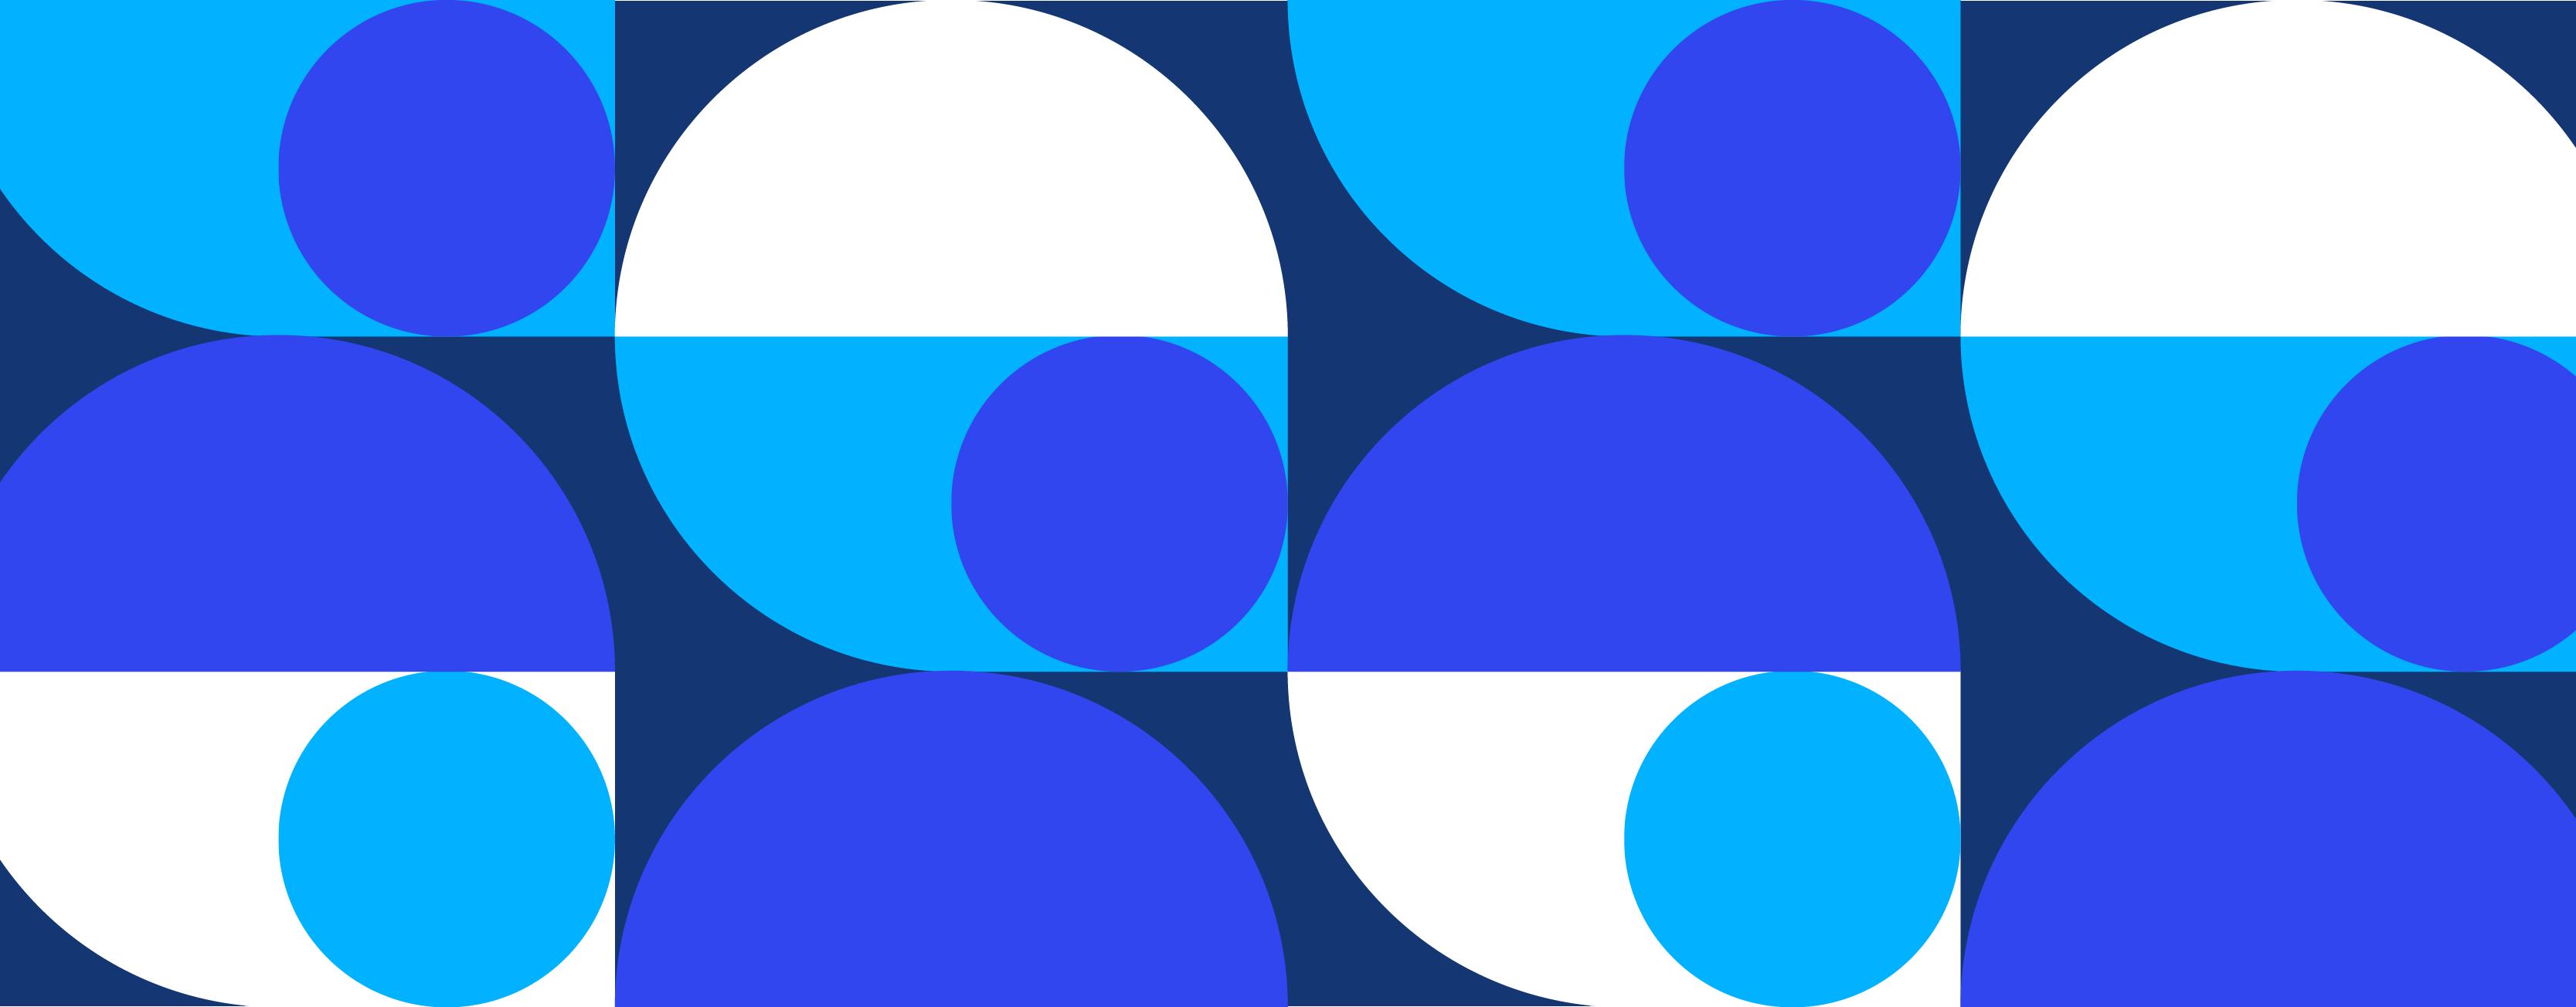 Brand pattern image